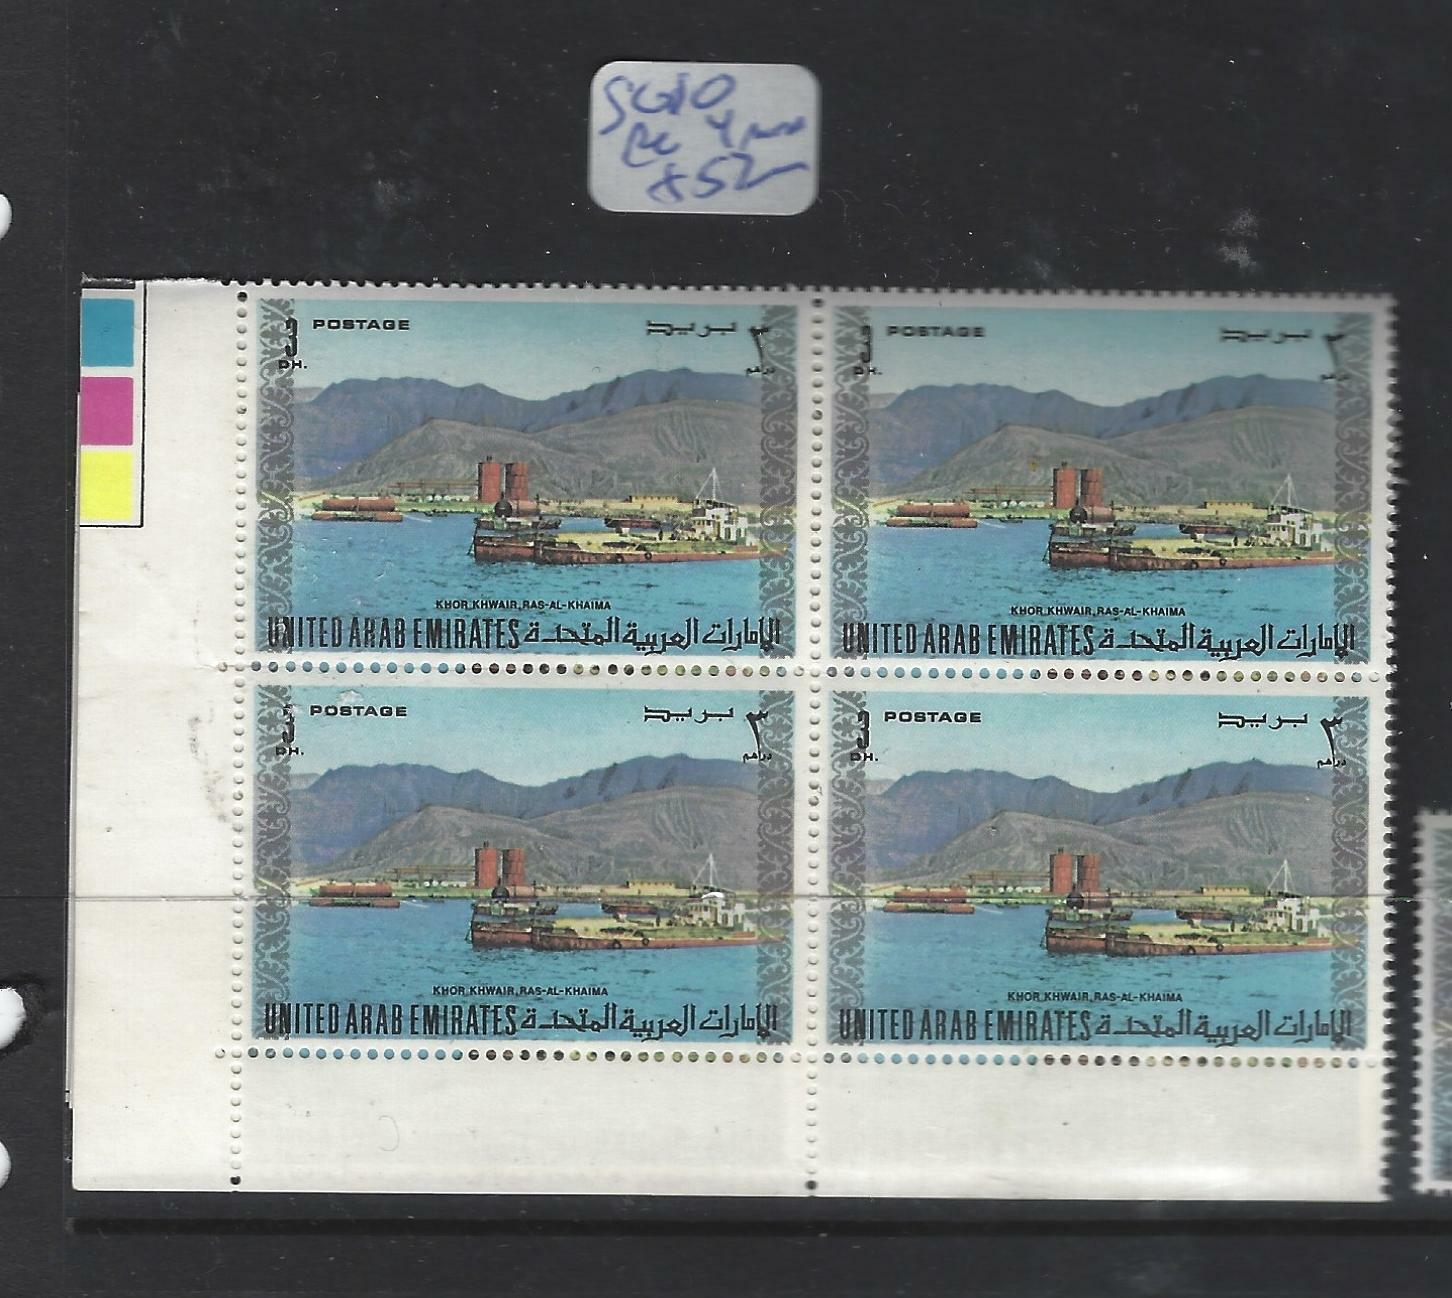 UNITED ARAB EMIRATES  (P3101BB)  3 DH  SG 10  BL OF 4   MNH